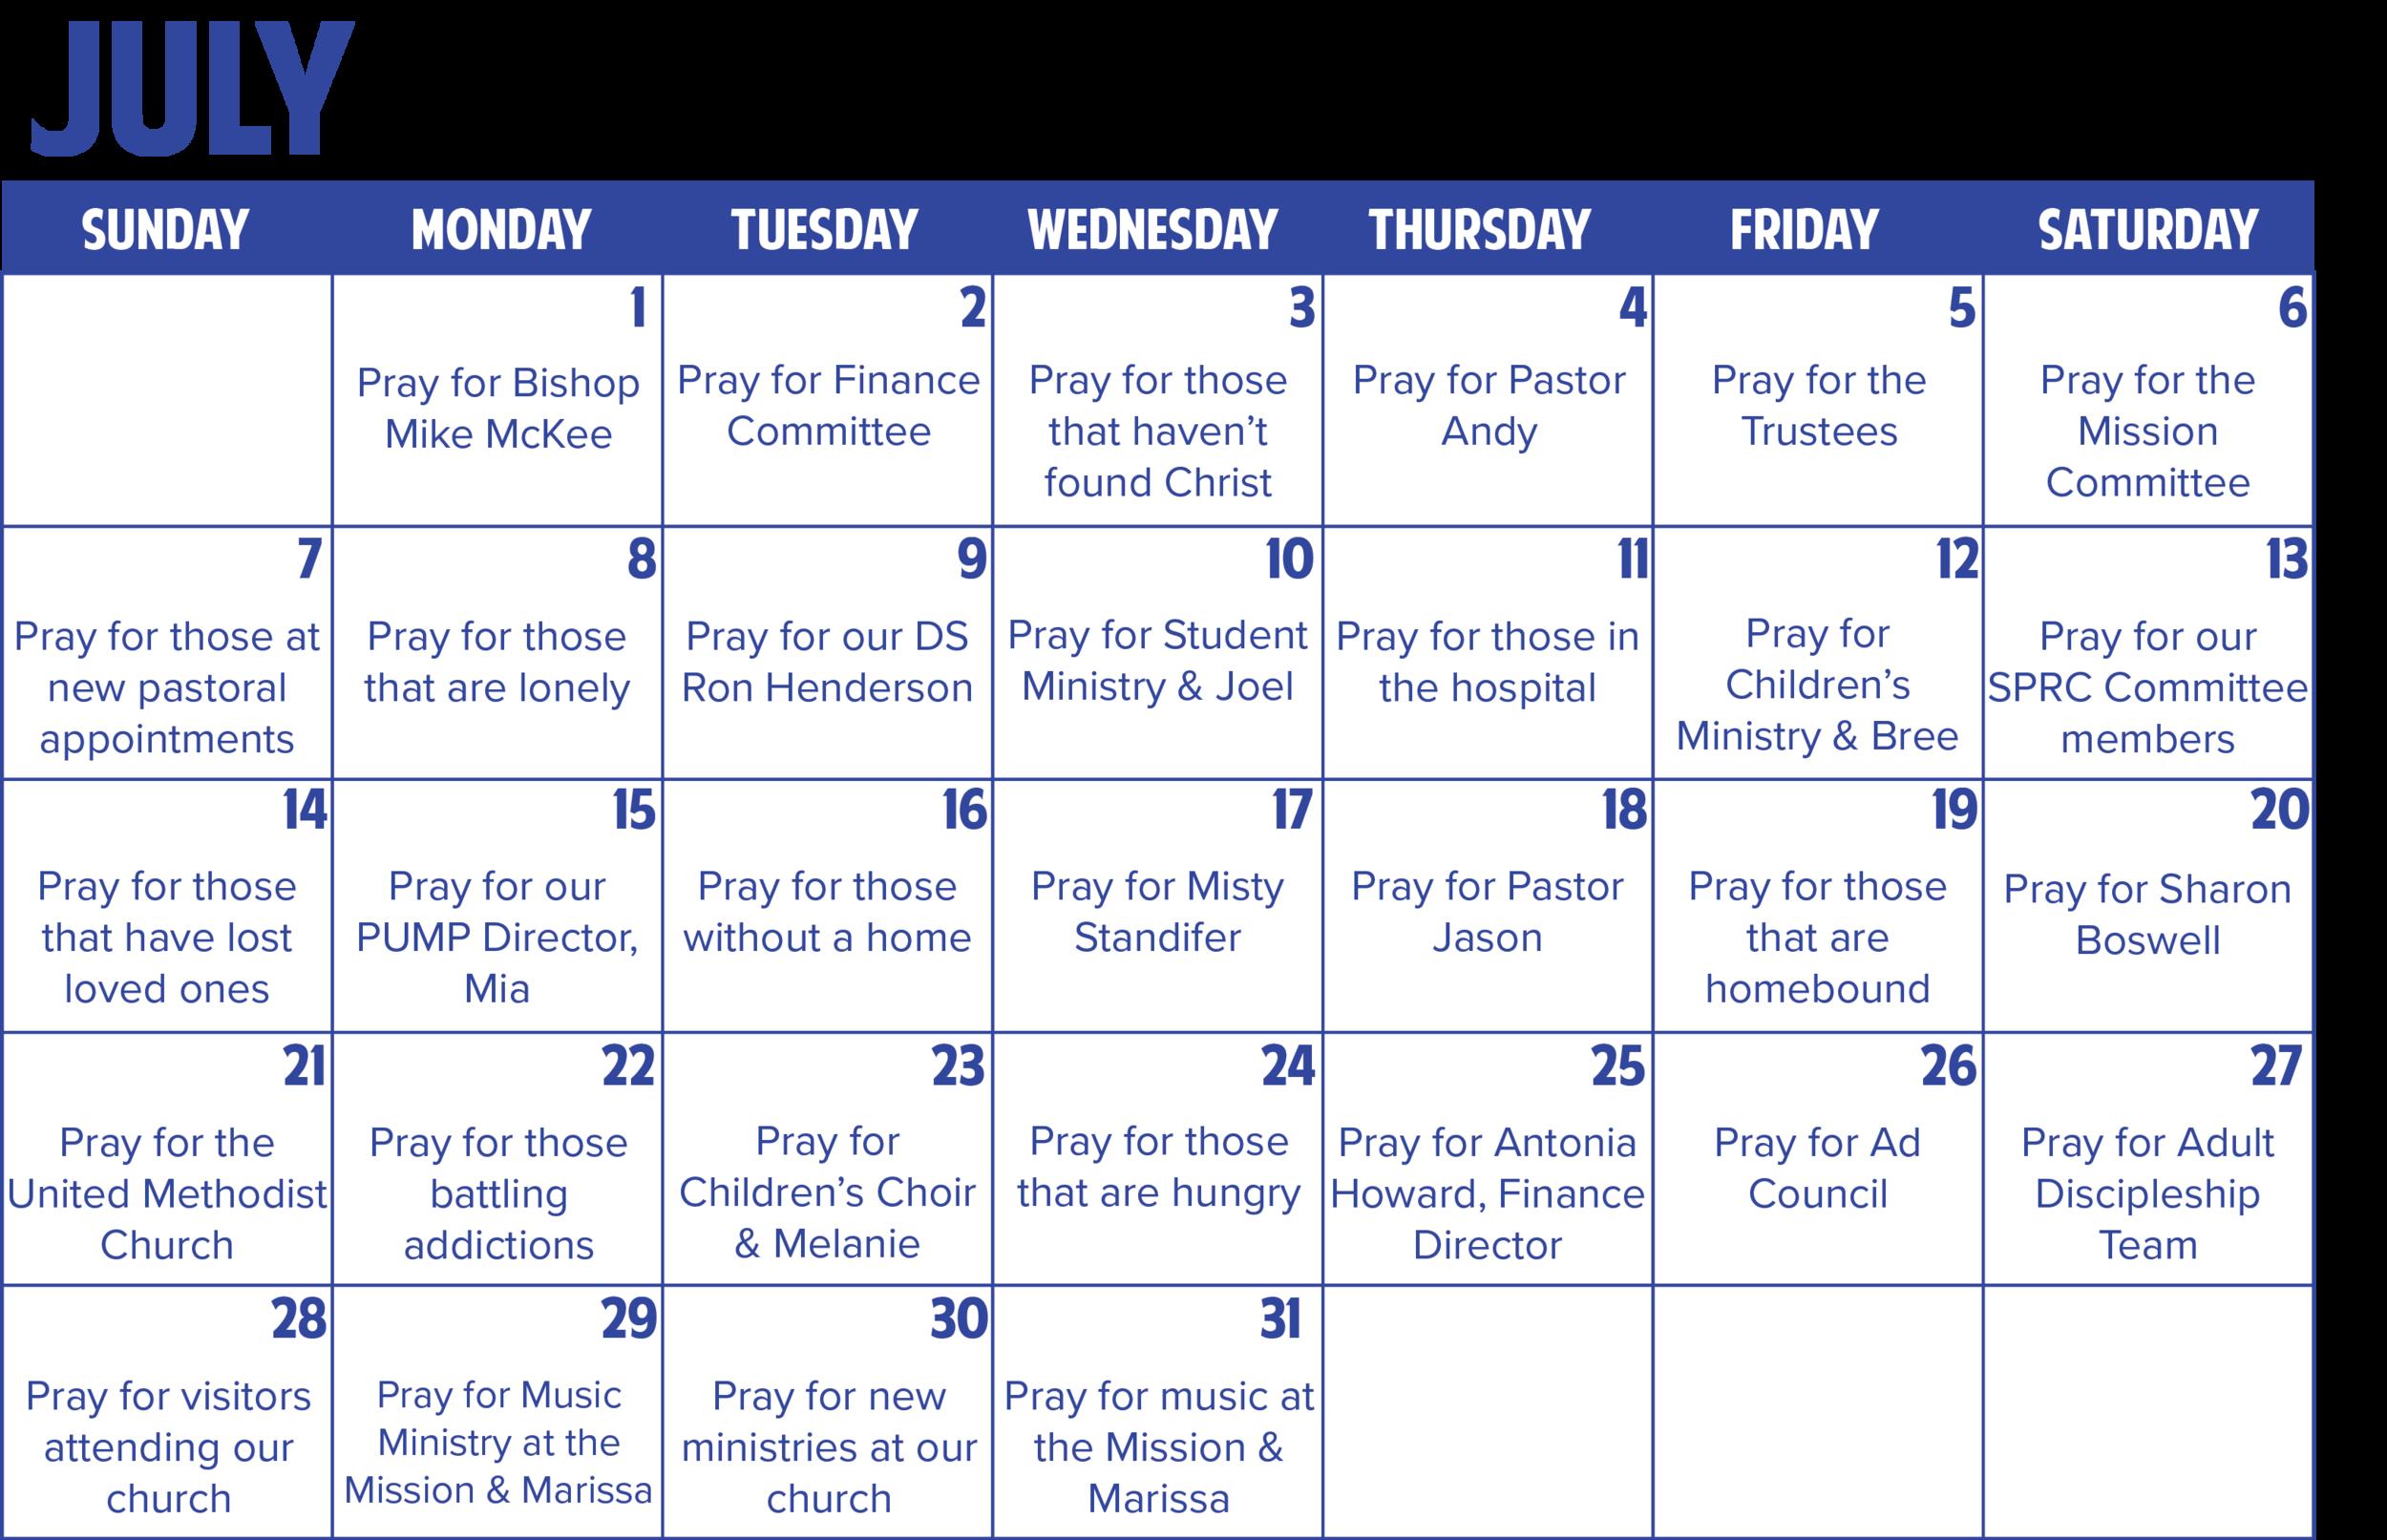 Prayer Calendar - July 2019.png